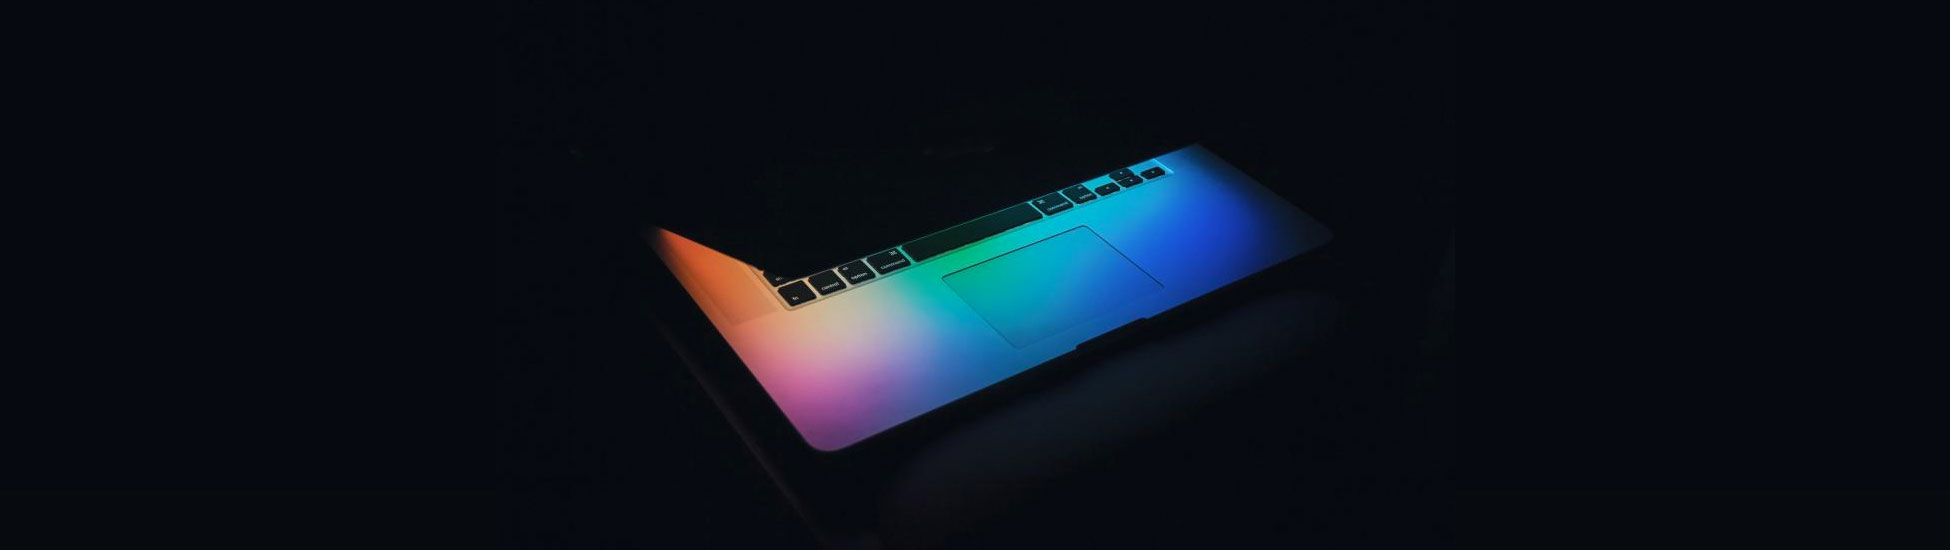 Webentwickler als Beruf?